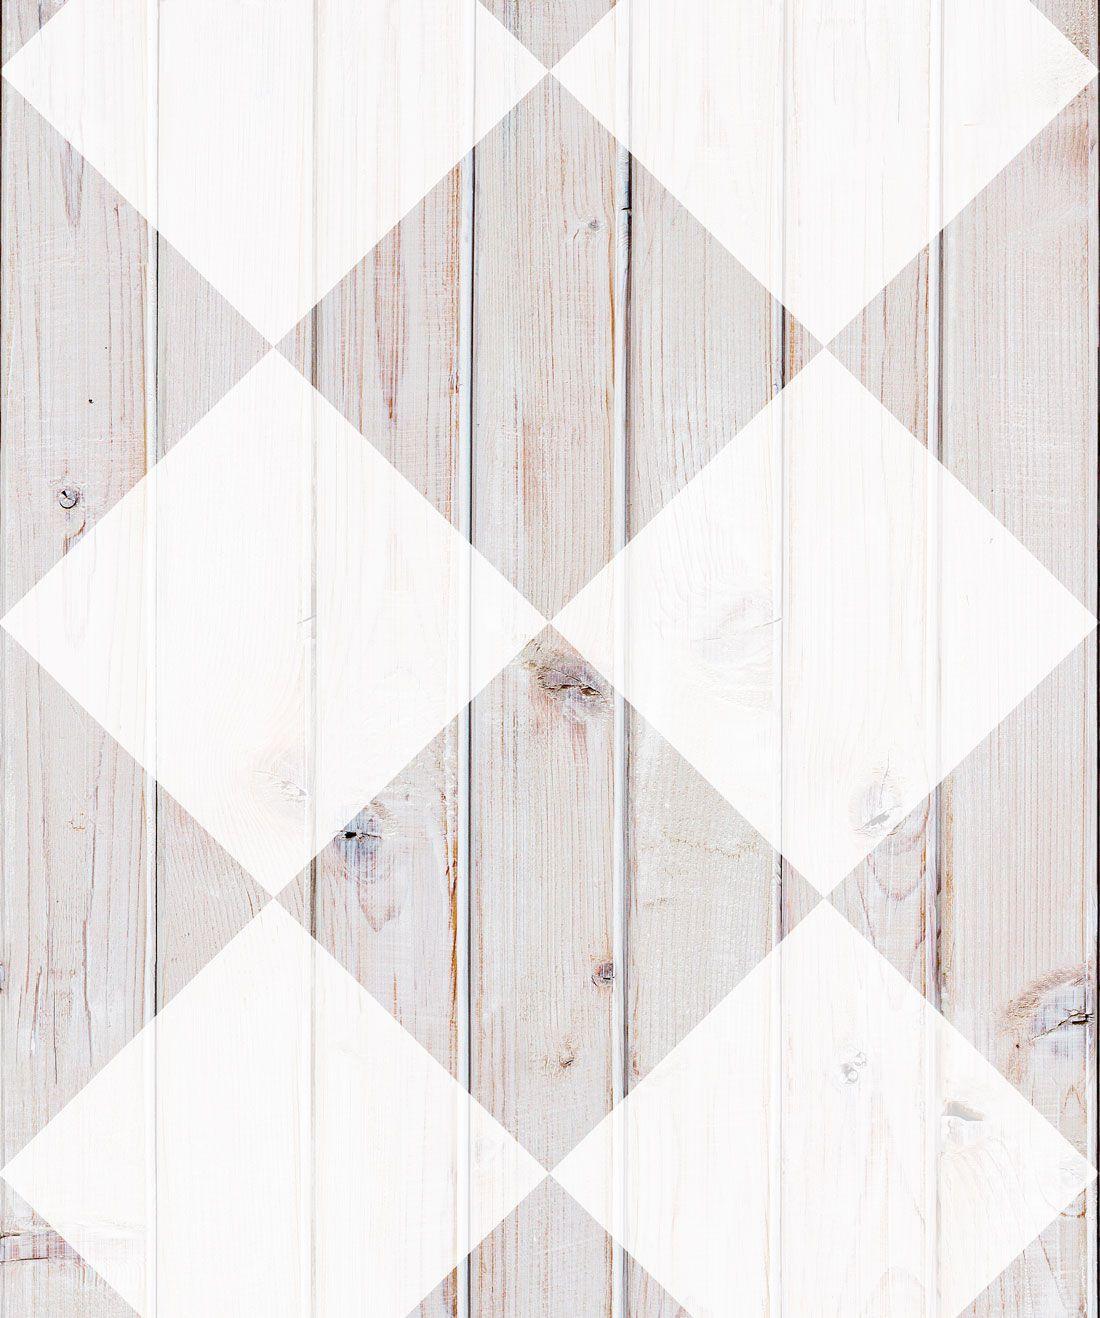 Maatila Talo Wallpaper